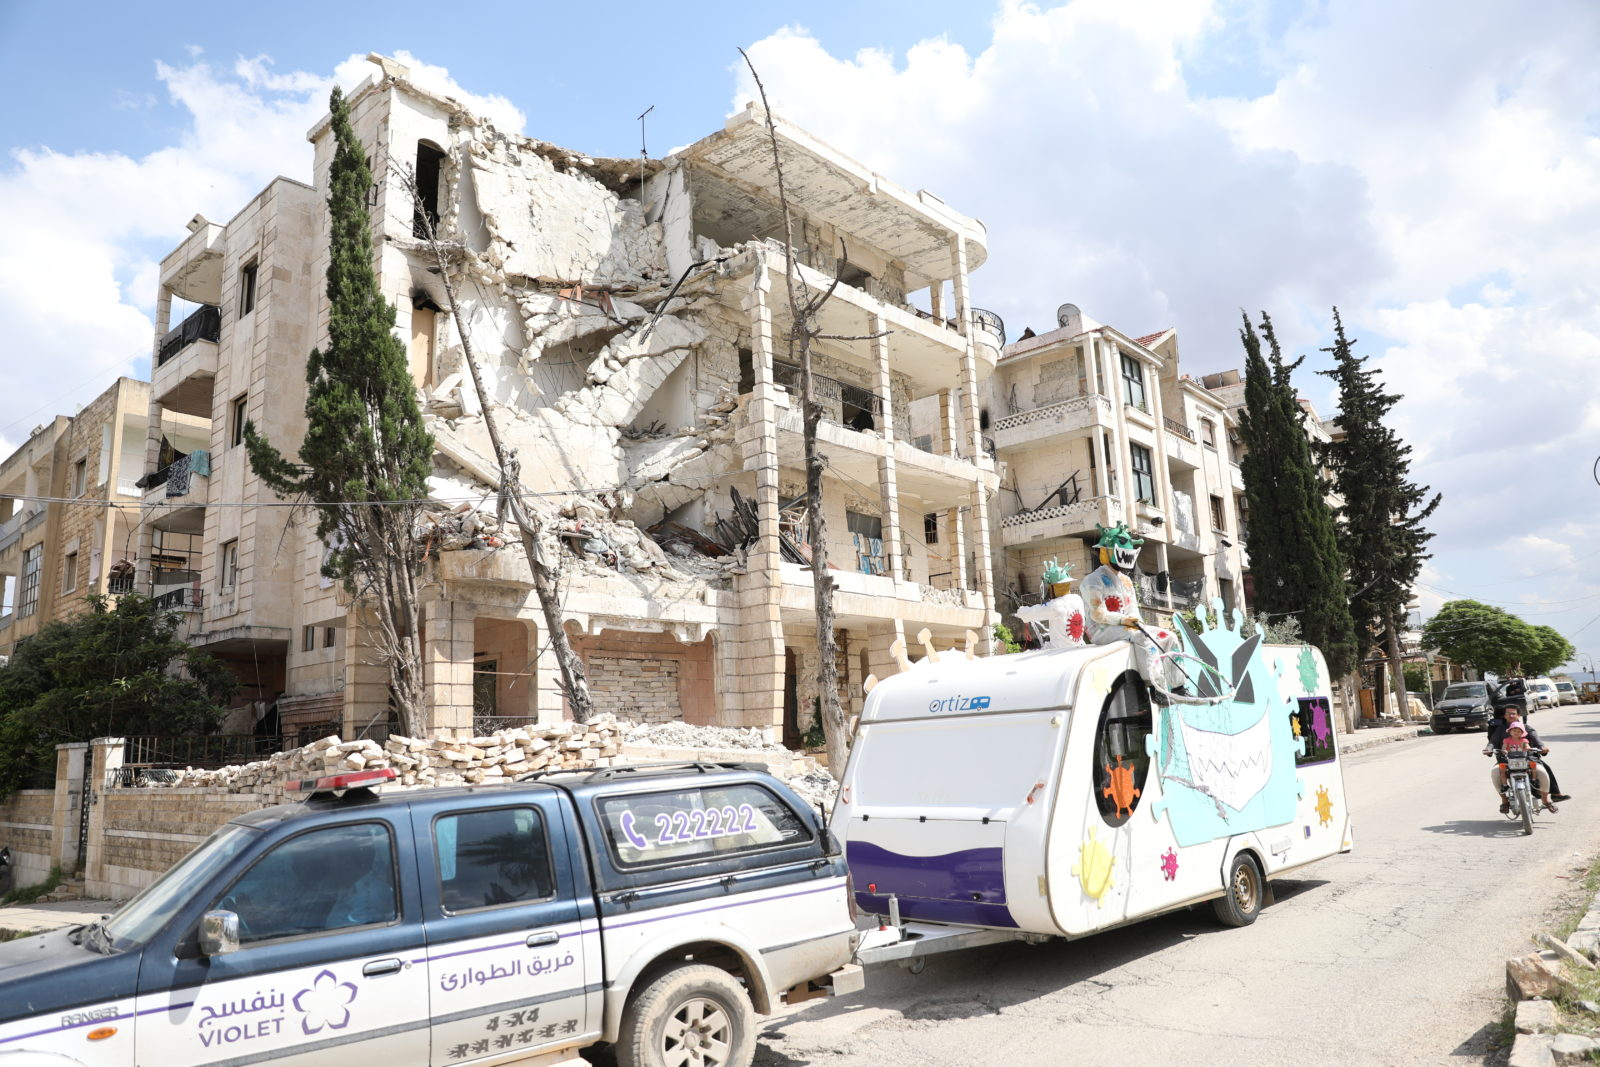 U.N labels Syrian, Russian airstrikes war crimes